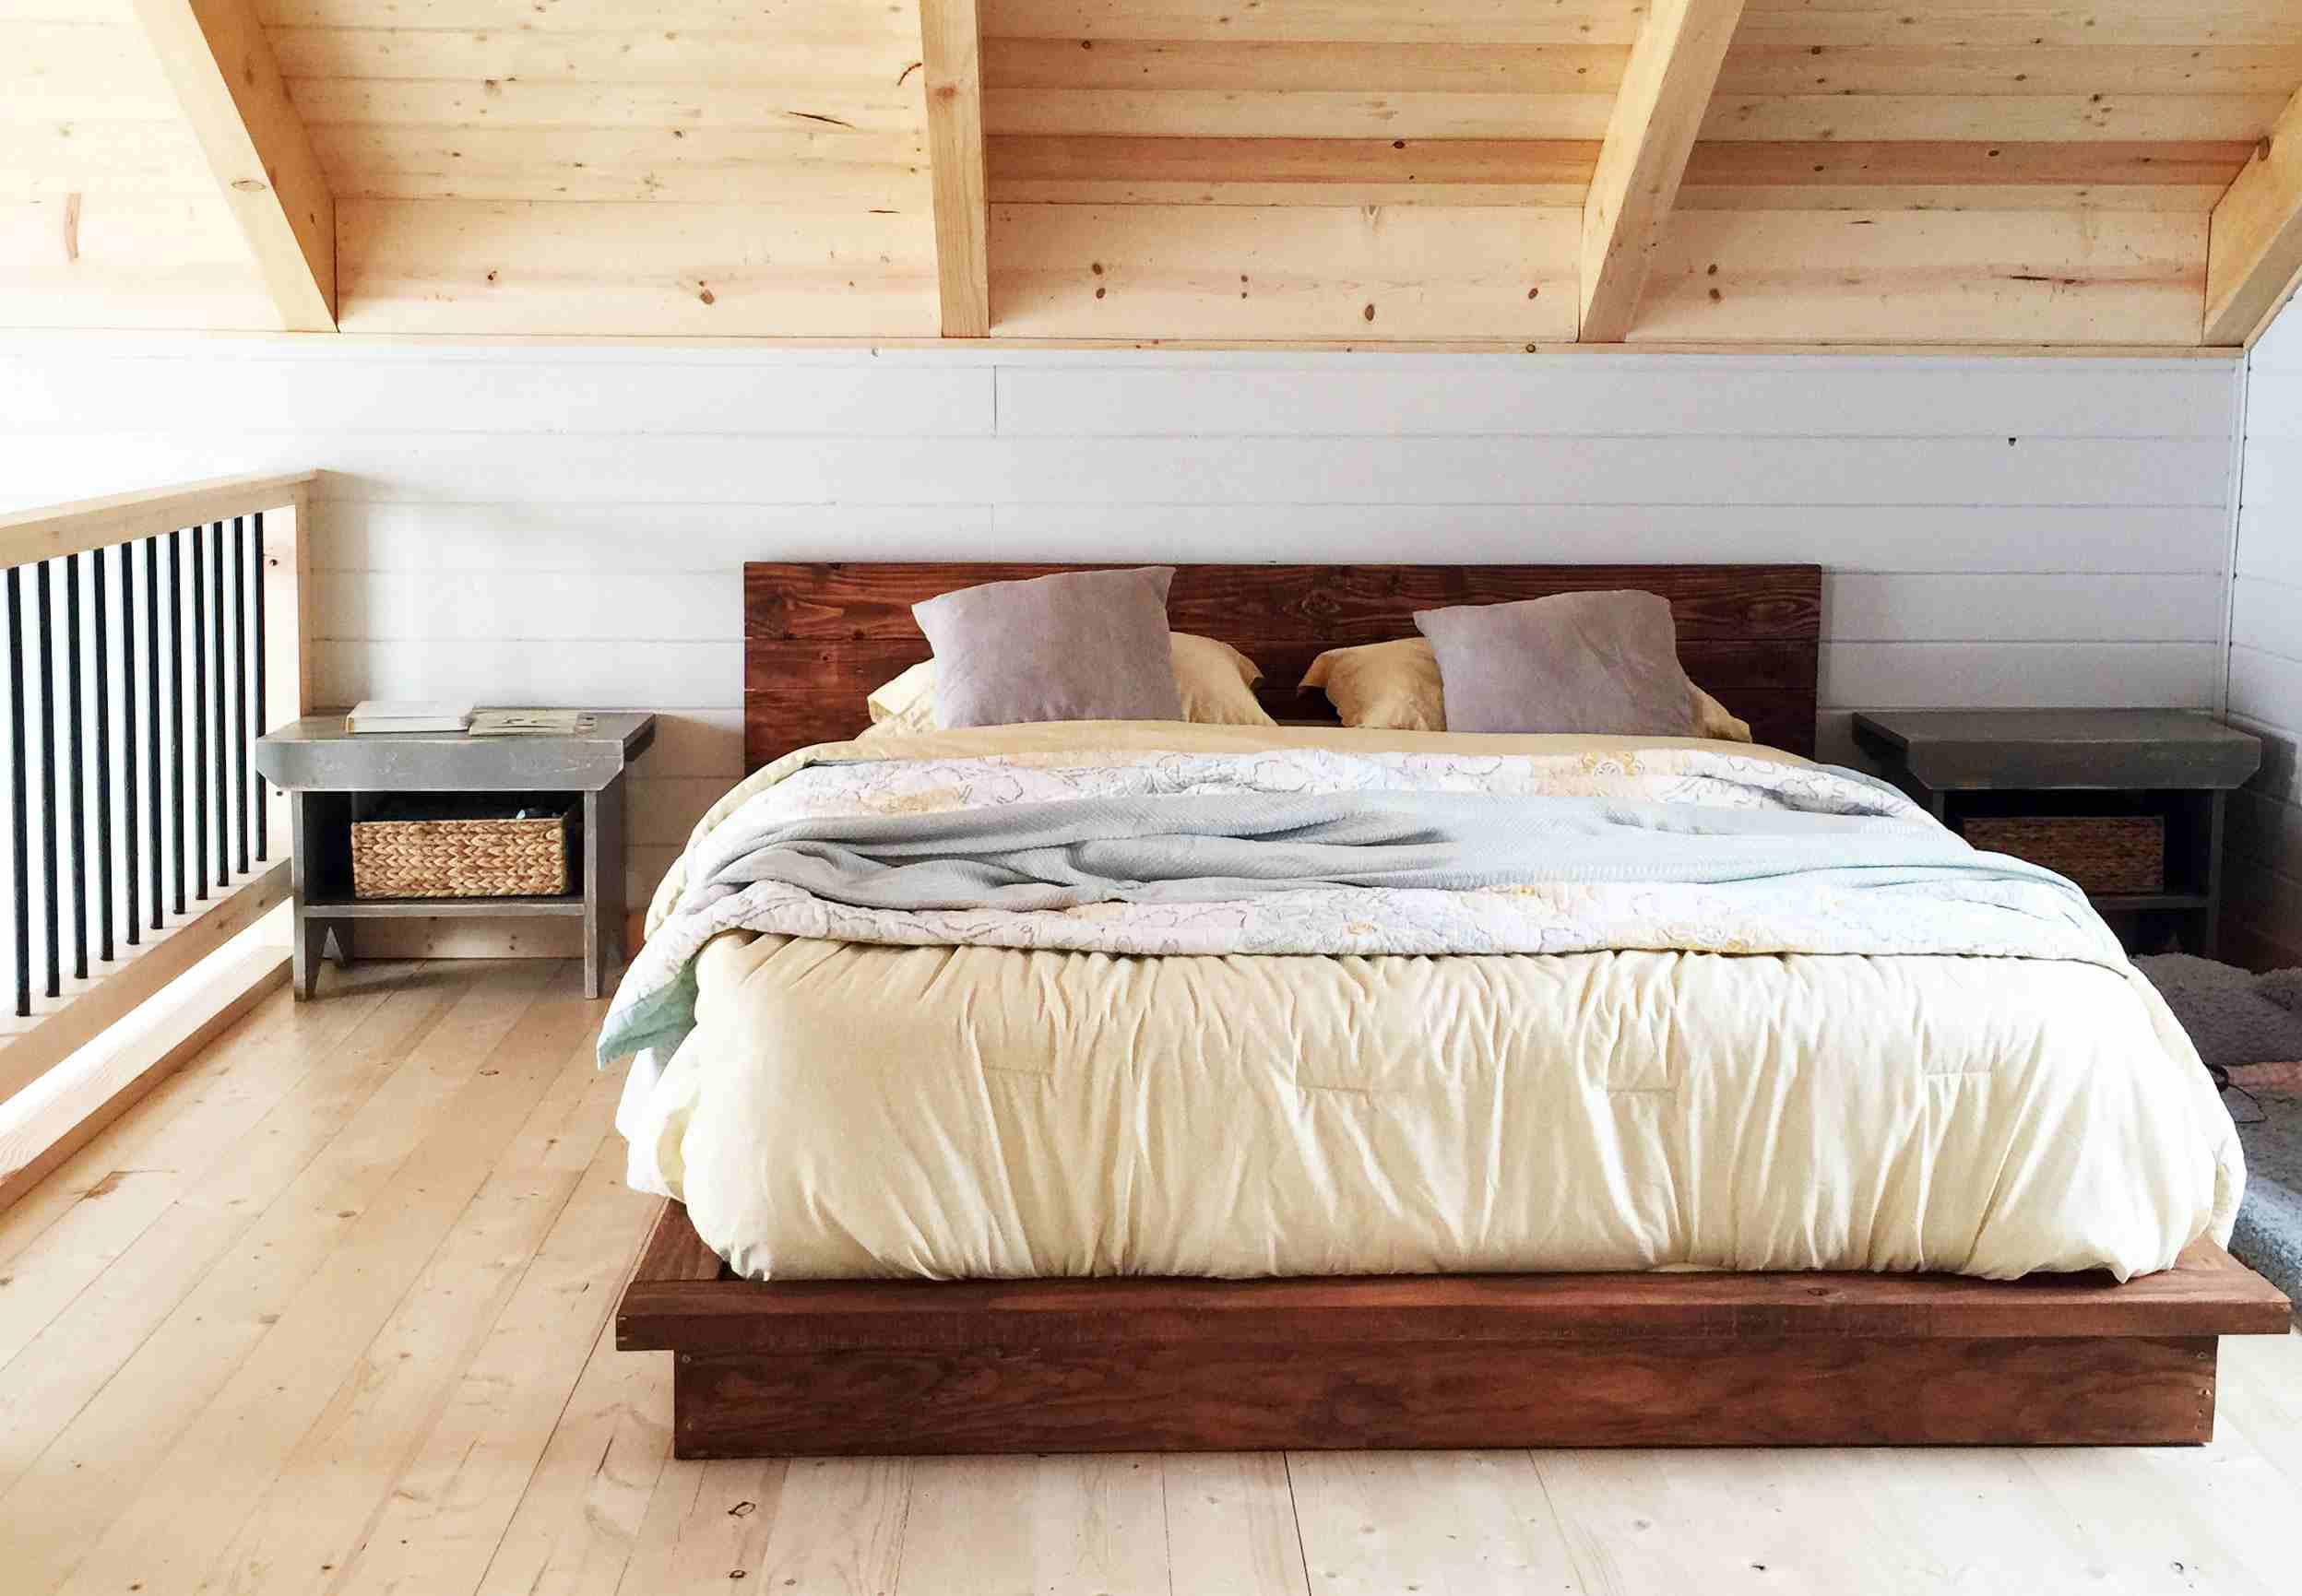 A king-sized platform bed in a loft